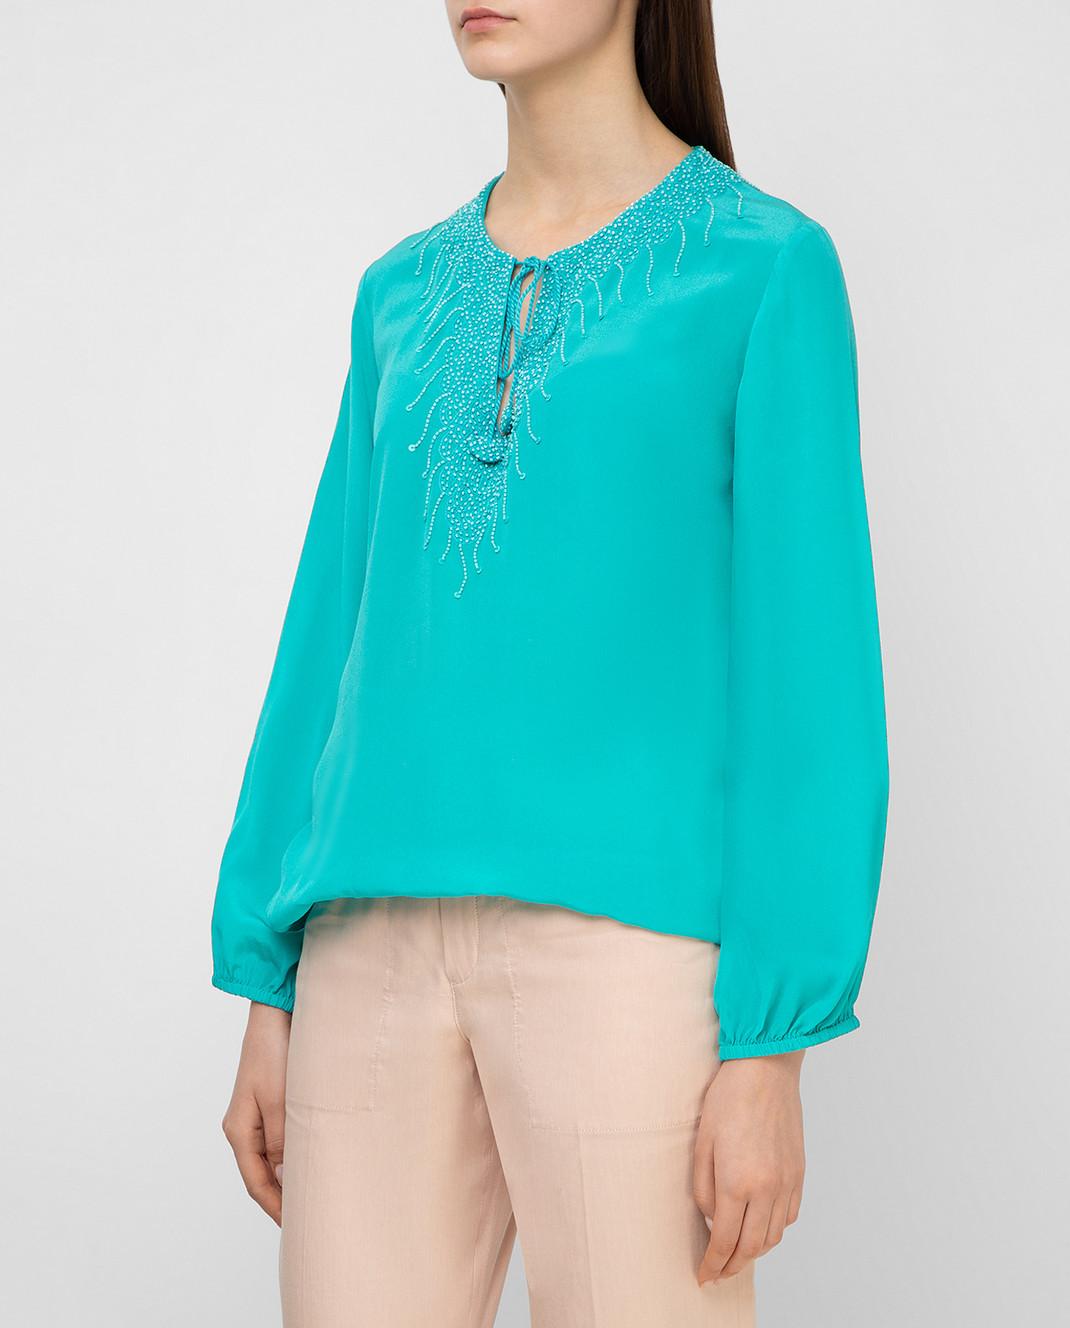 Taj by Sabrina Бирюзовая блуза из шелка SUSH1087 изображение 3